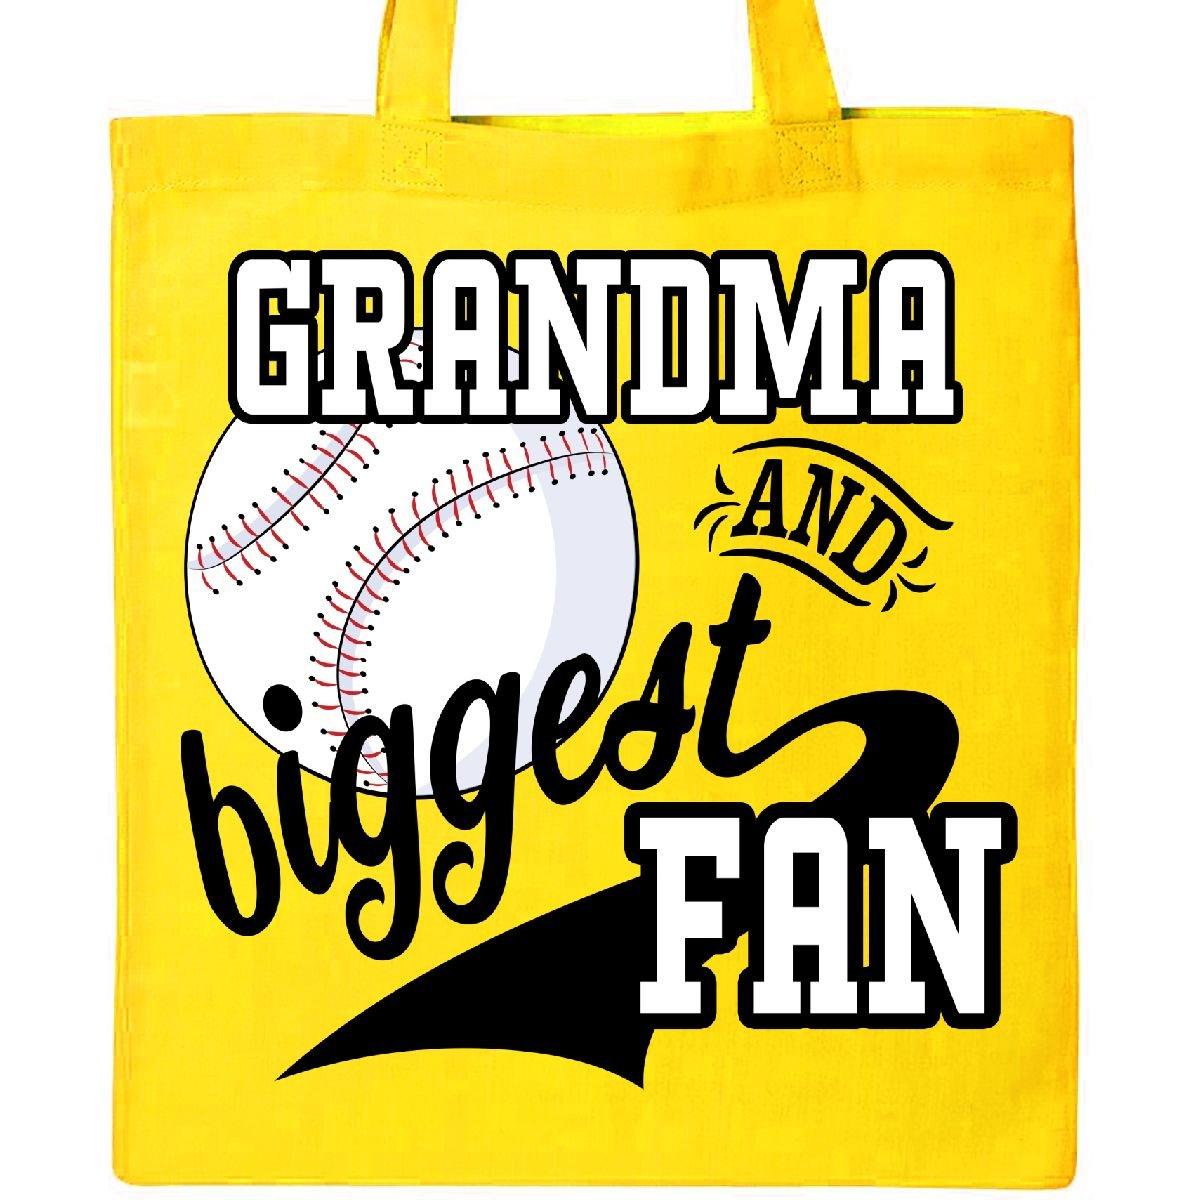 InktasticとおばあちゃんBiggestファン – 野球ファミリファントートバッグ One Size イエロー B072MN64MY